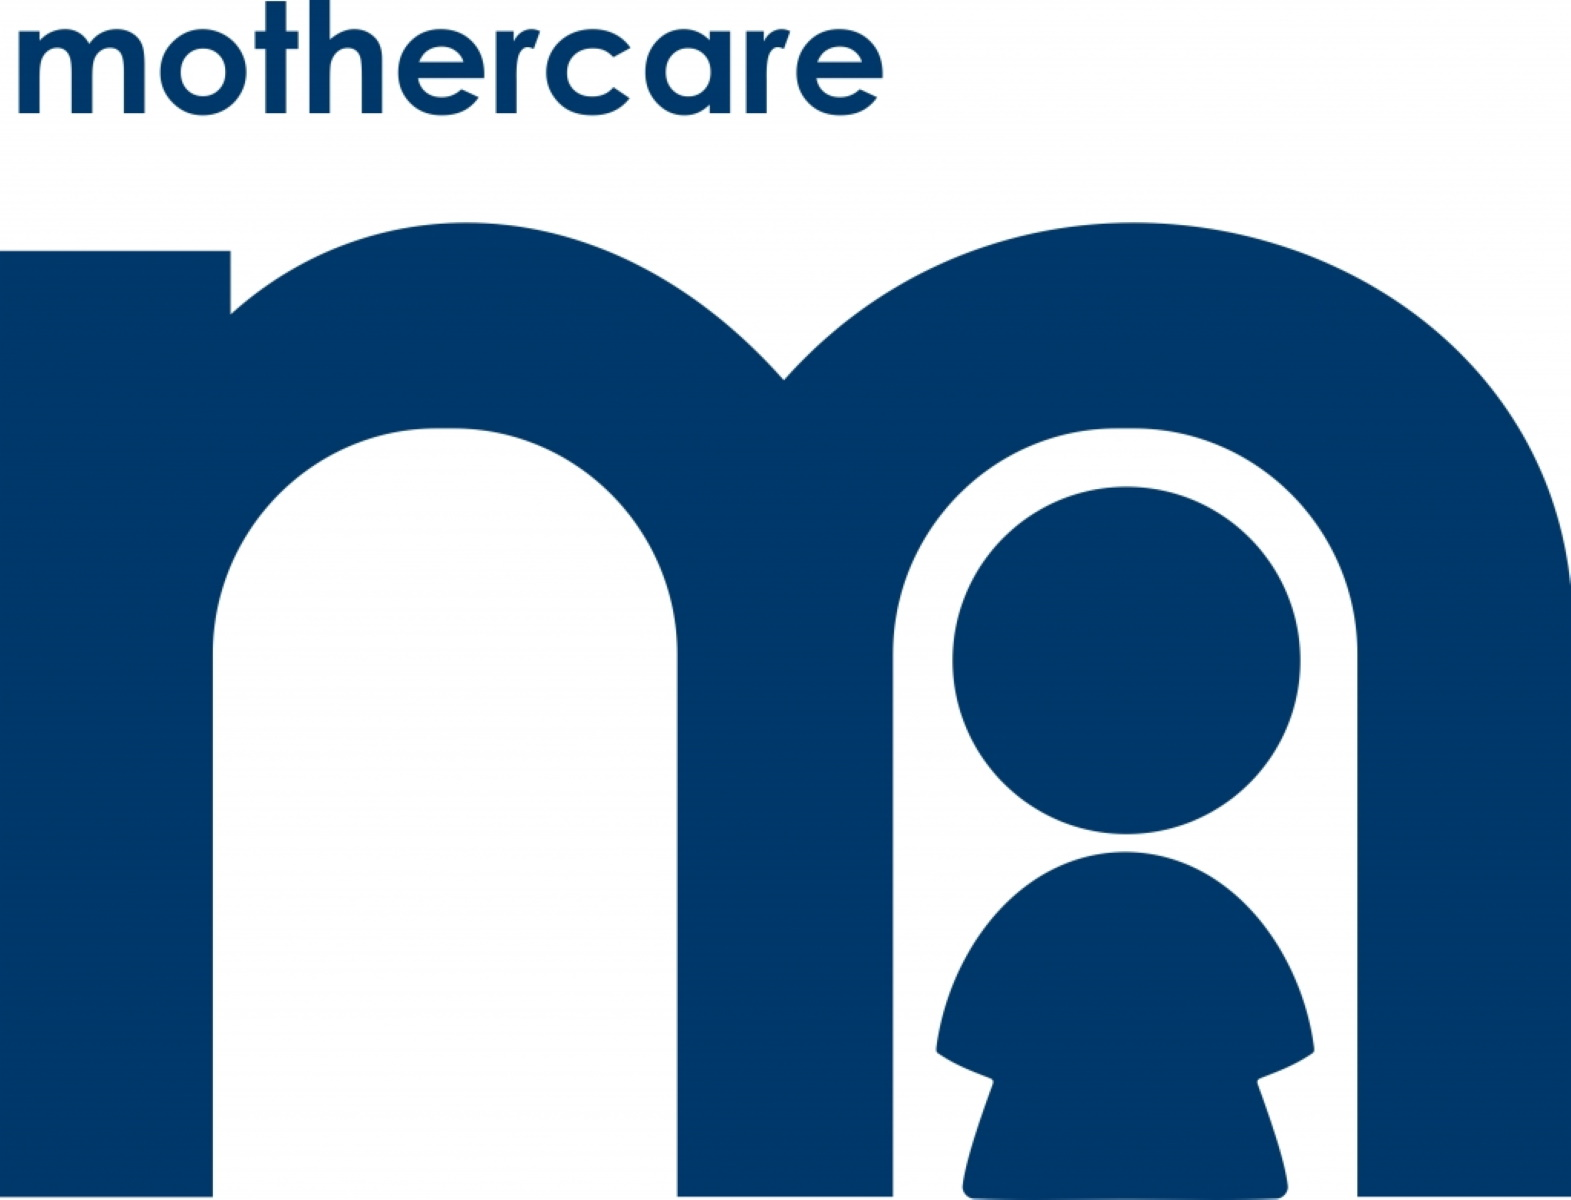 Mothercare: Κλείνει το κατάστημα της Ερμού και στη θέση του ανοίγει κατάστημα αθλητικών ειδών